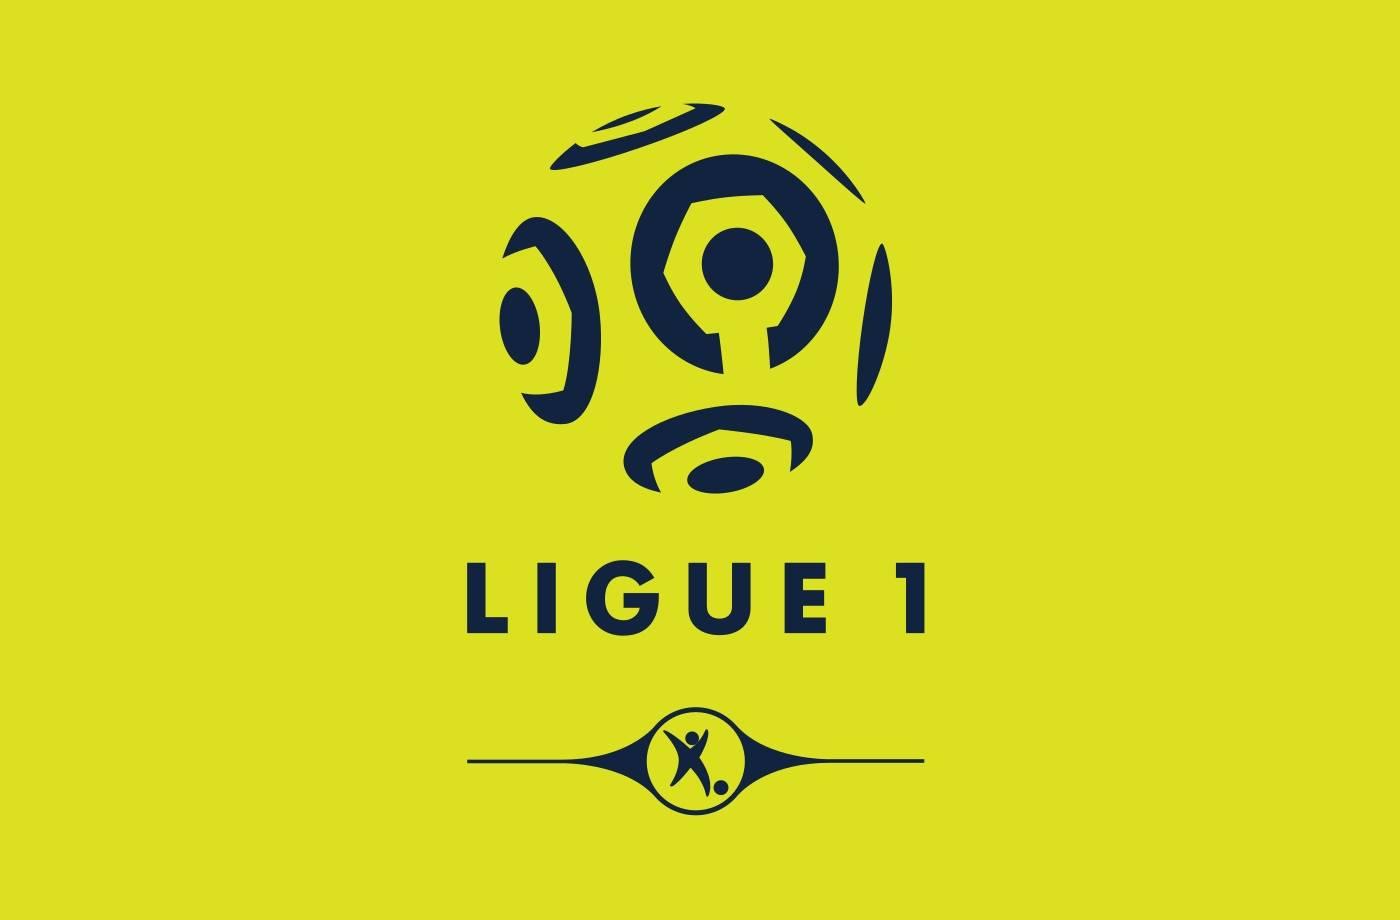 Paris Saint Germain Vs Amiens Sc Full Match Ligue 1 Eplfootballmatch Com